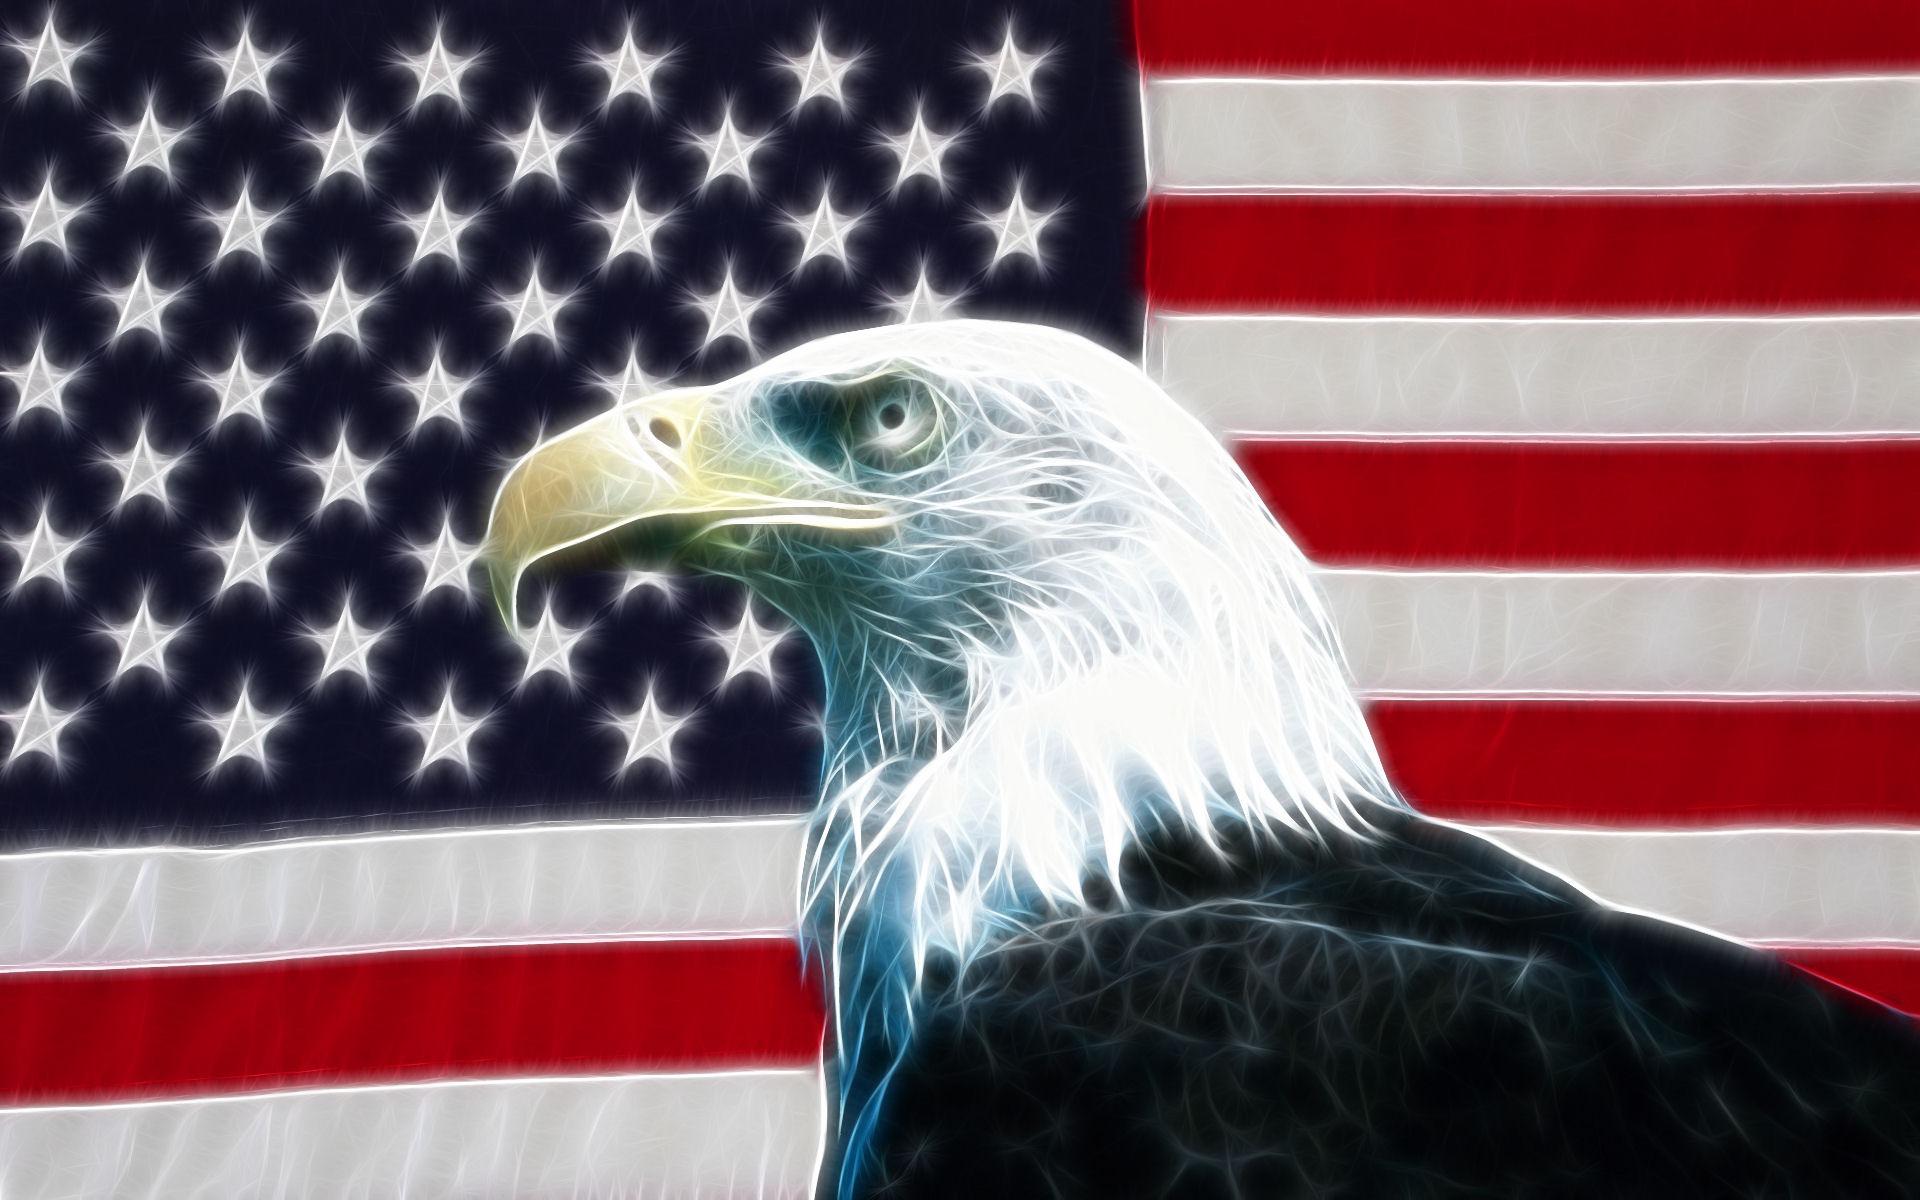 American Eagle Wallpapers 1920x1200 RYTDI77   4USkY 1920x1200